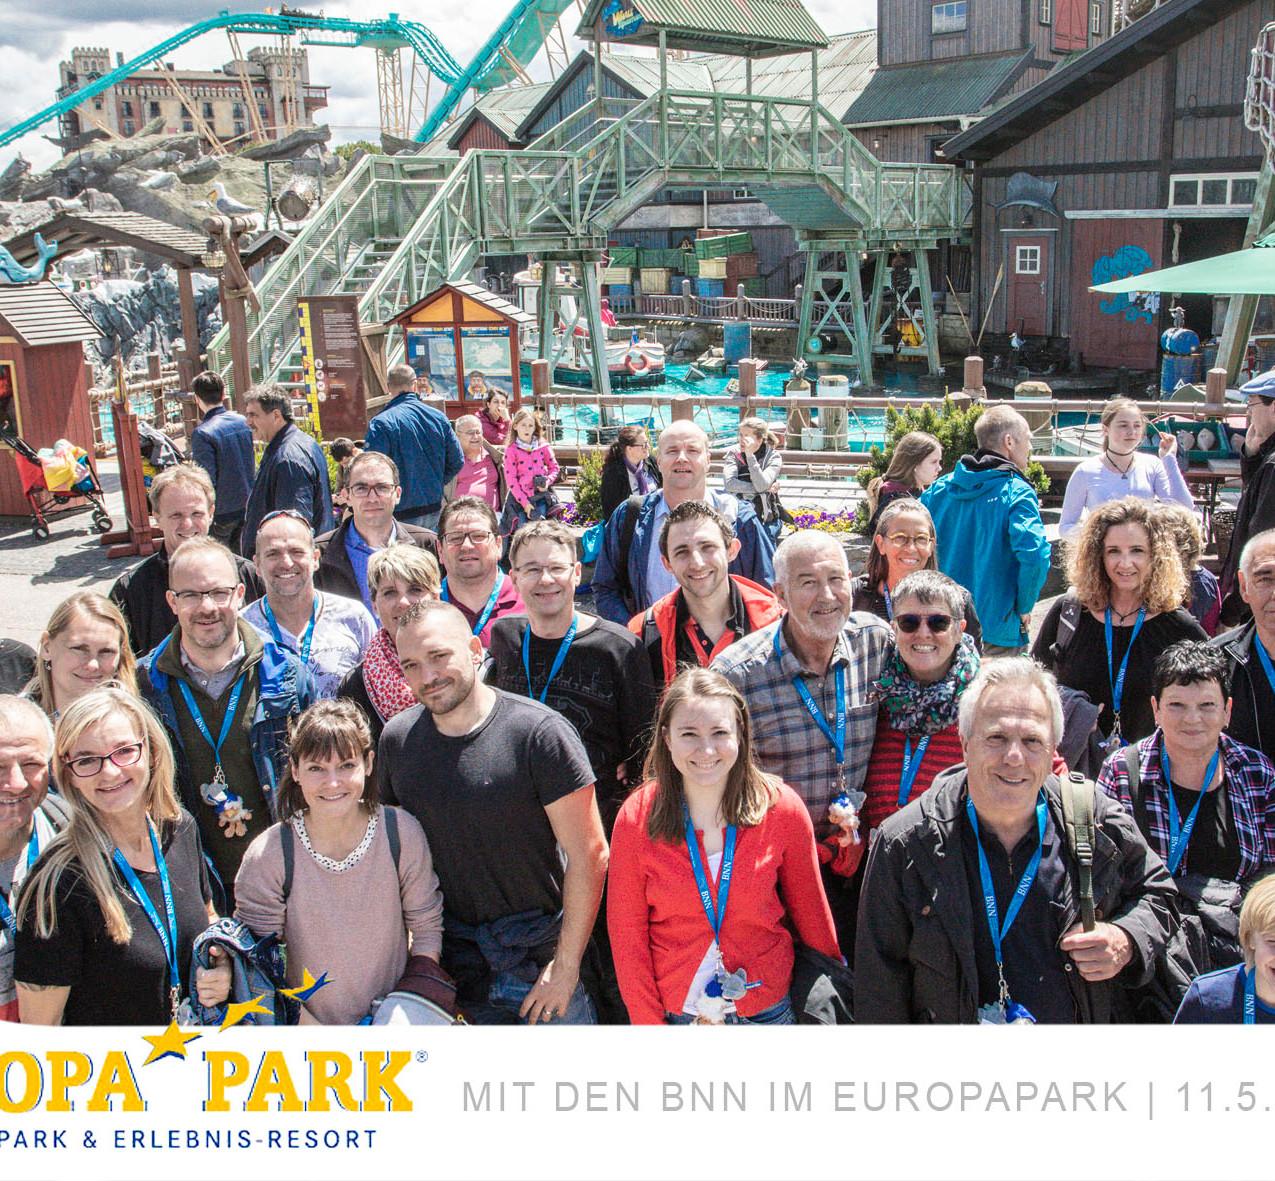 20190510_FB_Europapark_4